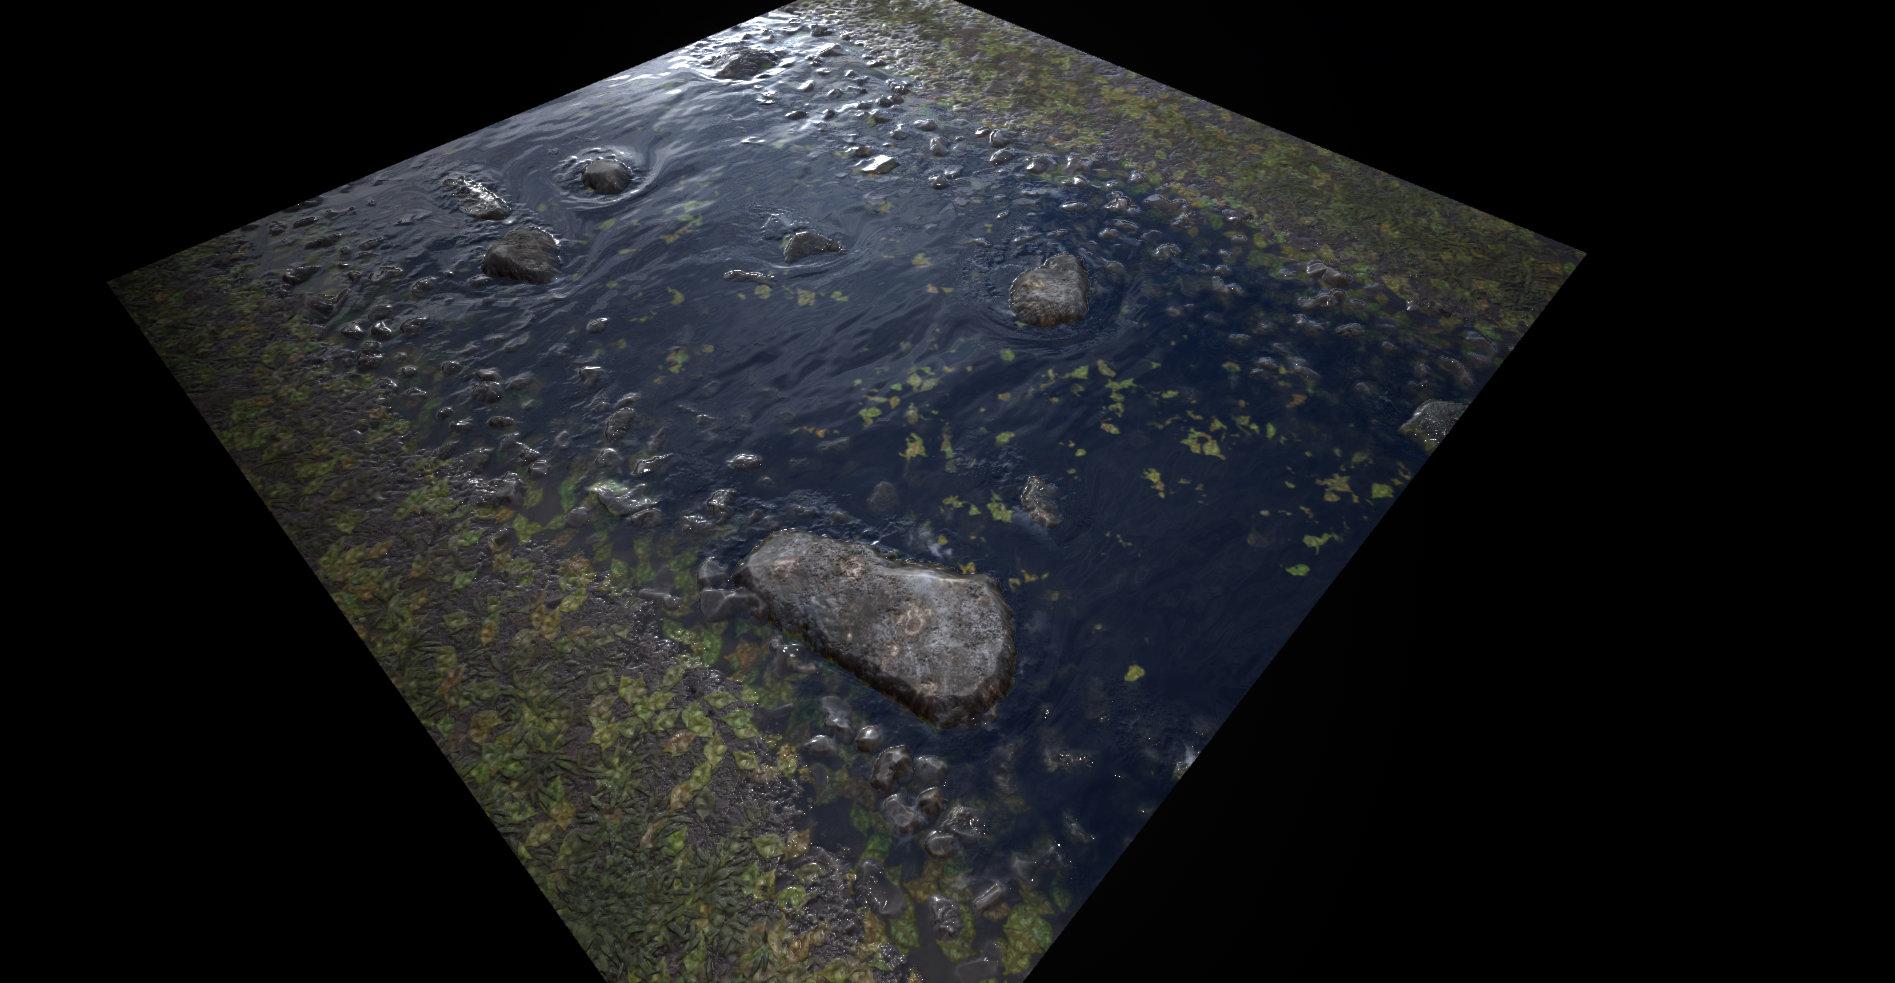 sebastian-schade-stream-03.jpg?1437351520